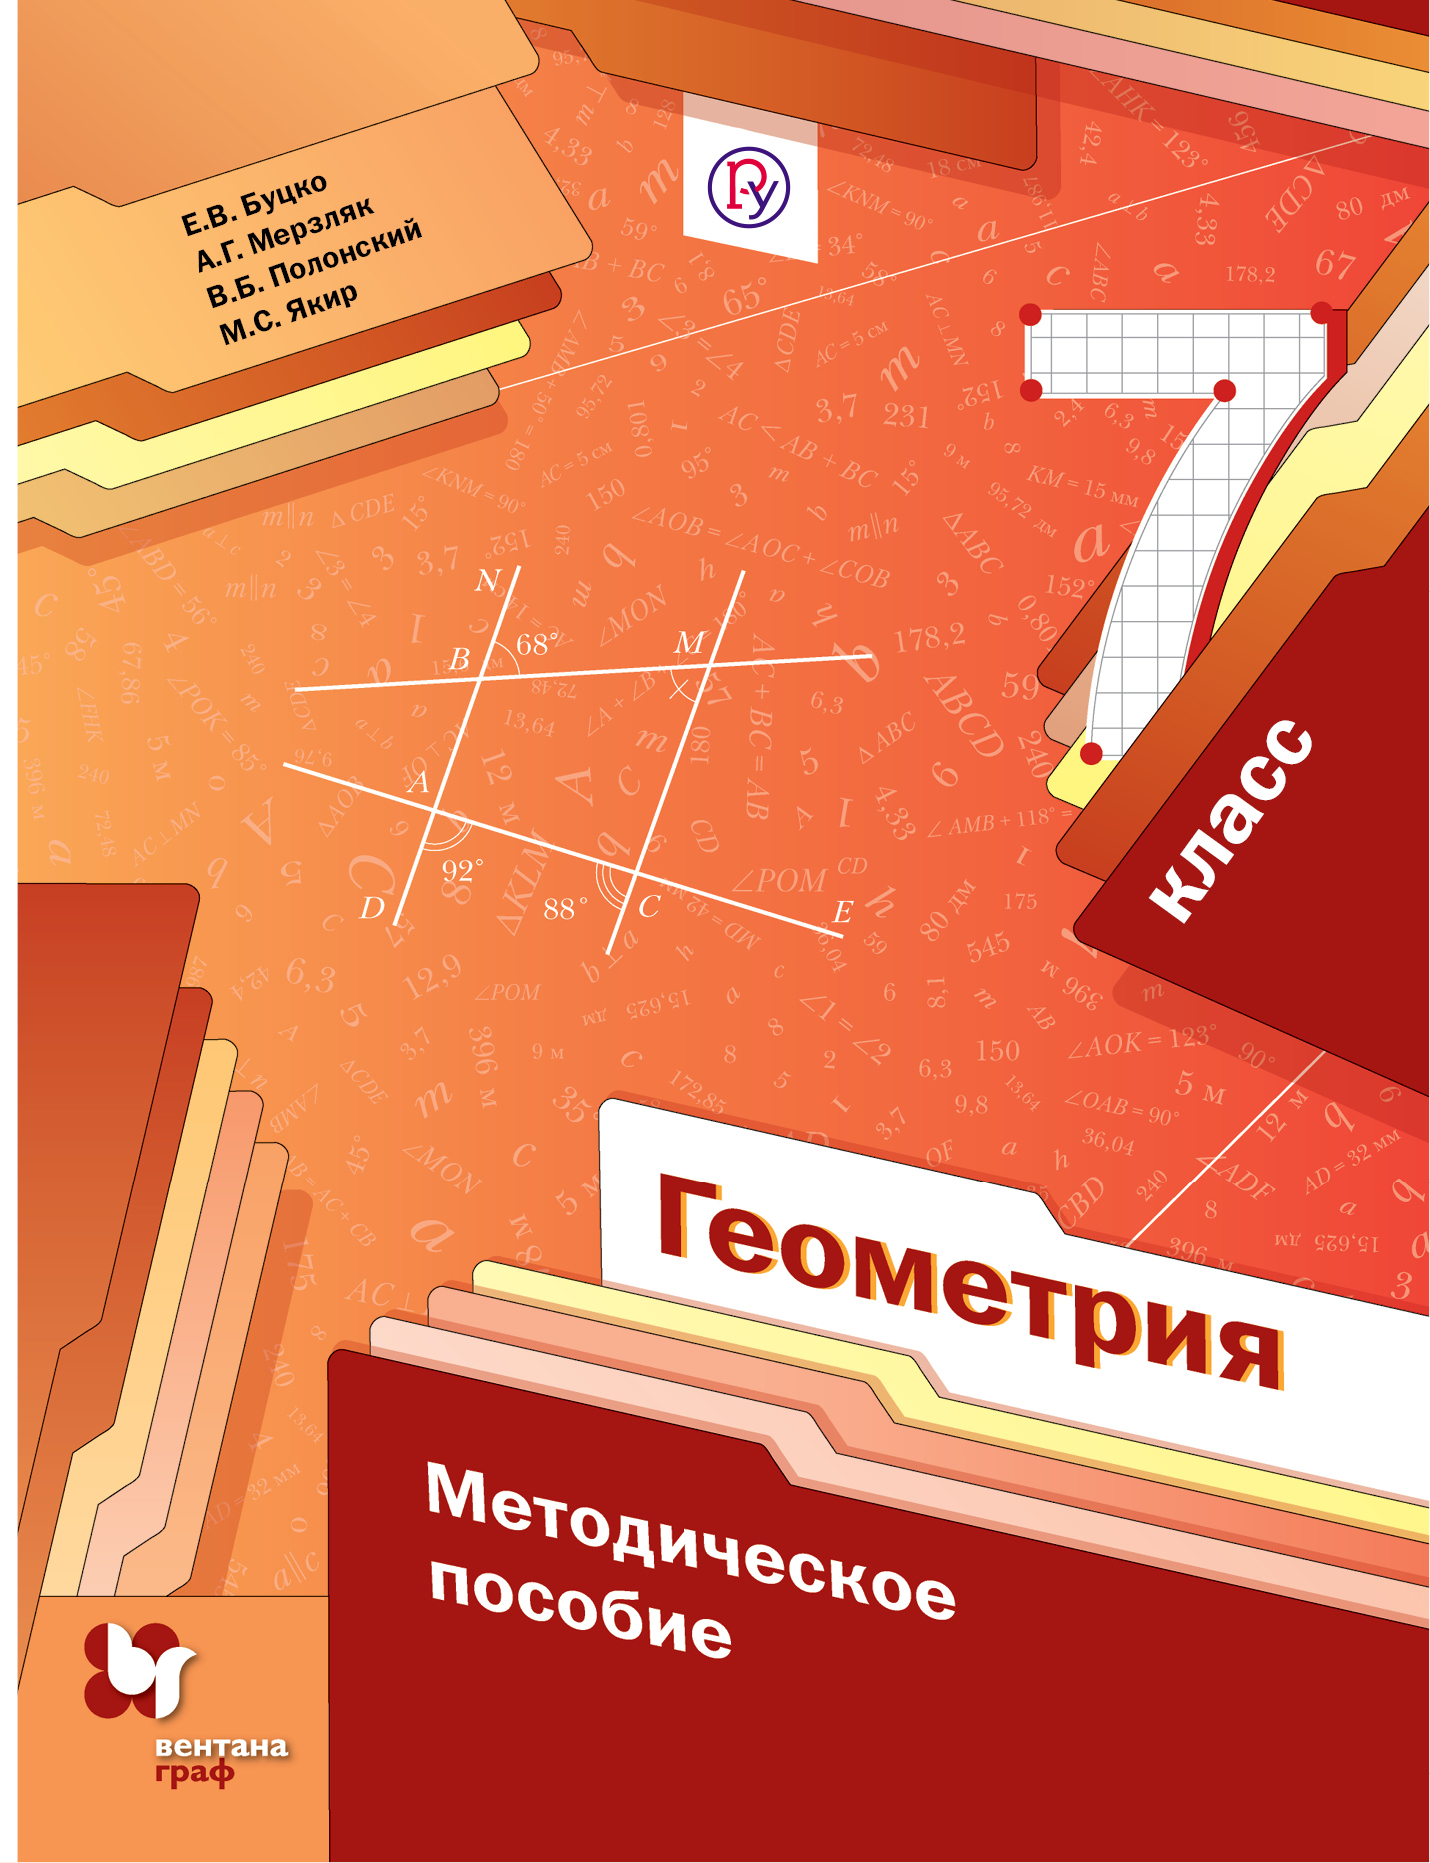 Геометрия. 7класс. Методическое пособие. от book24.ru